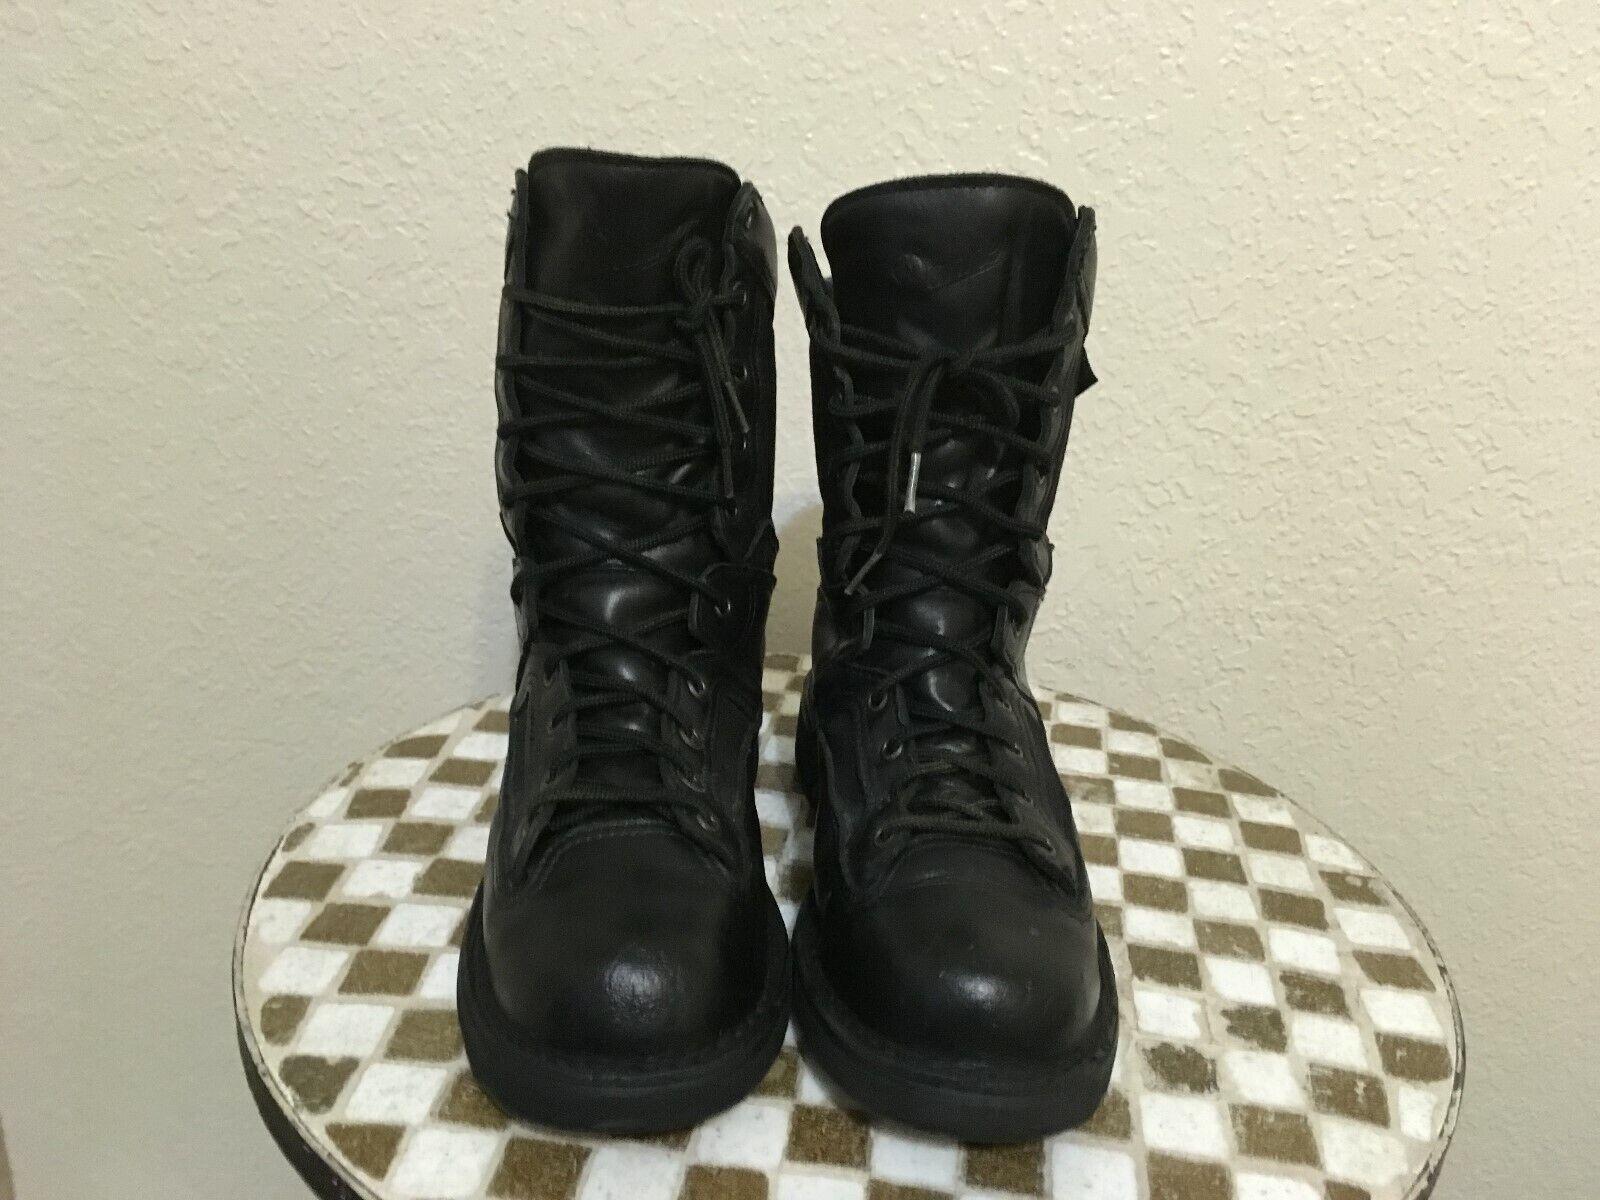 EE. UU. Negro Cuero Elite Acadia Danner Militar botas acordonadas Taladro 8.5 D